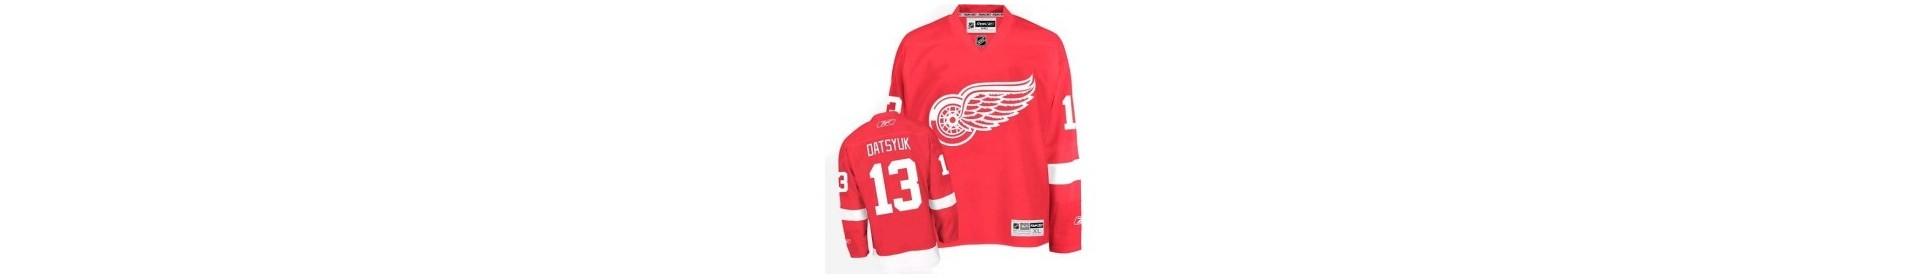 Textile Hockey - Le Vestiaire